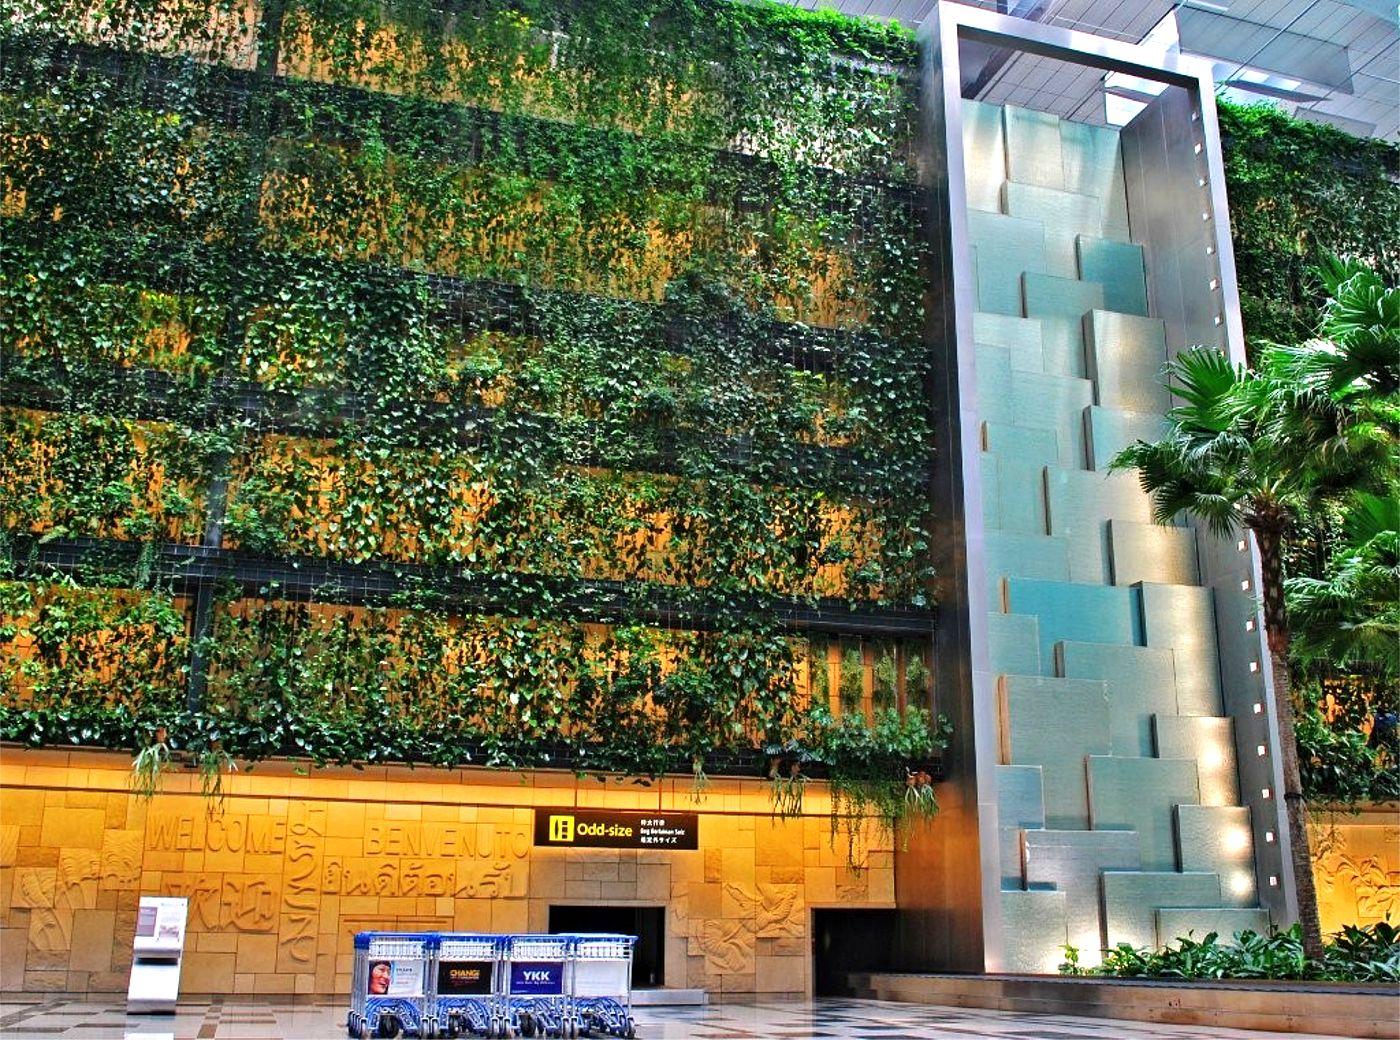 Climbers Plants Wall